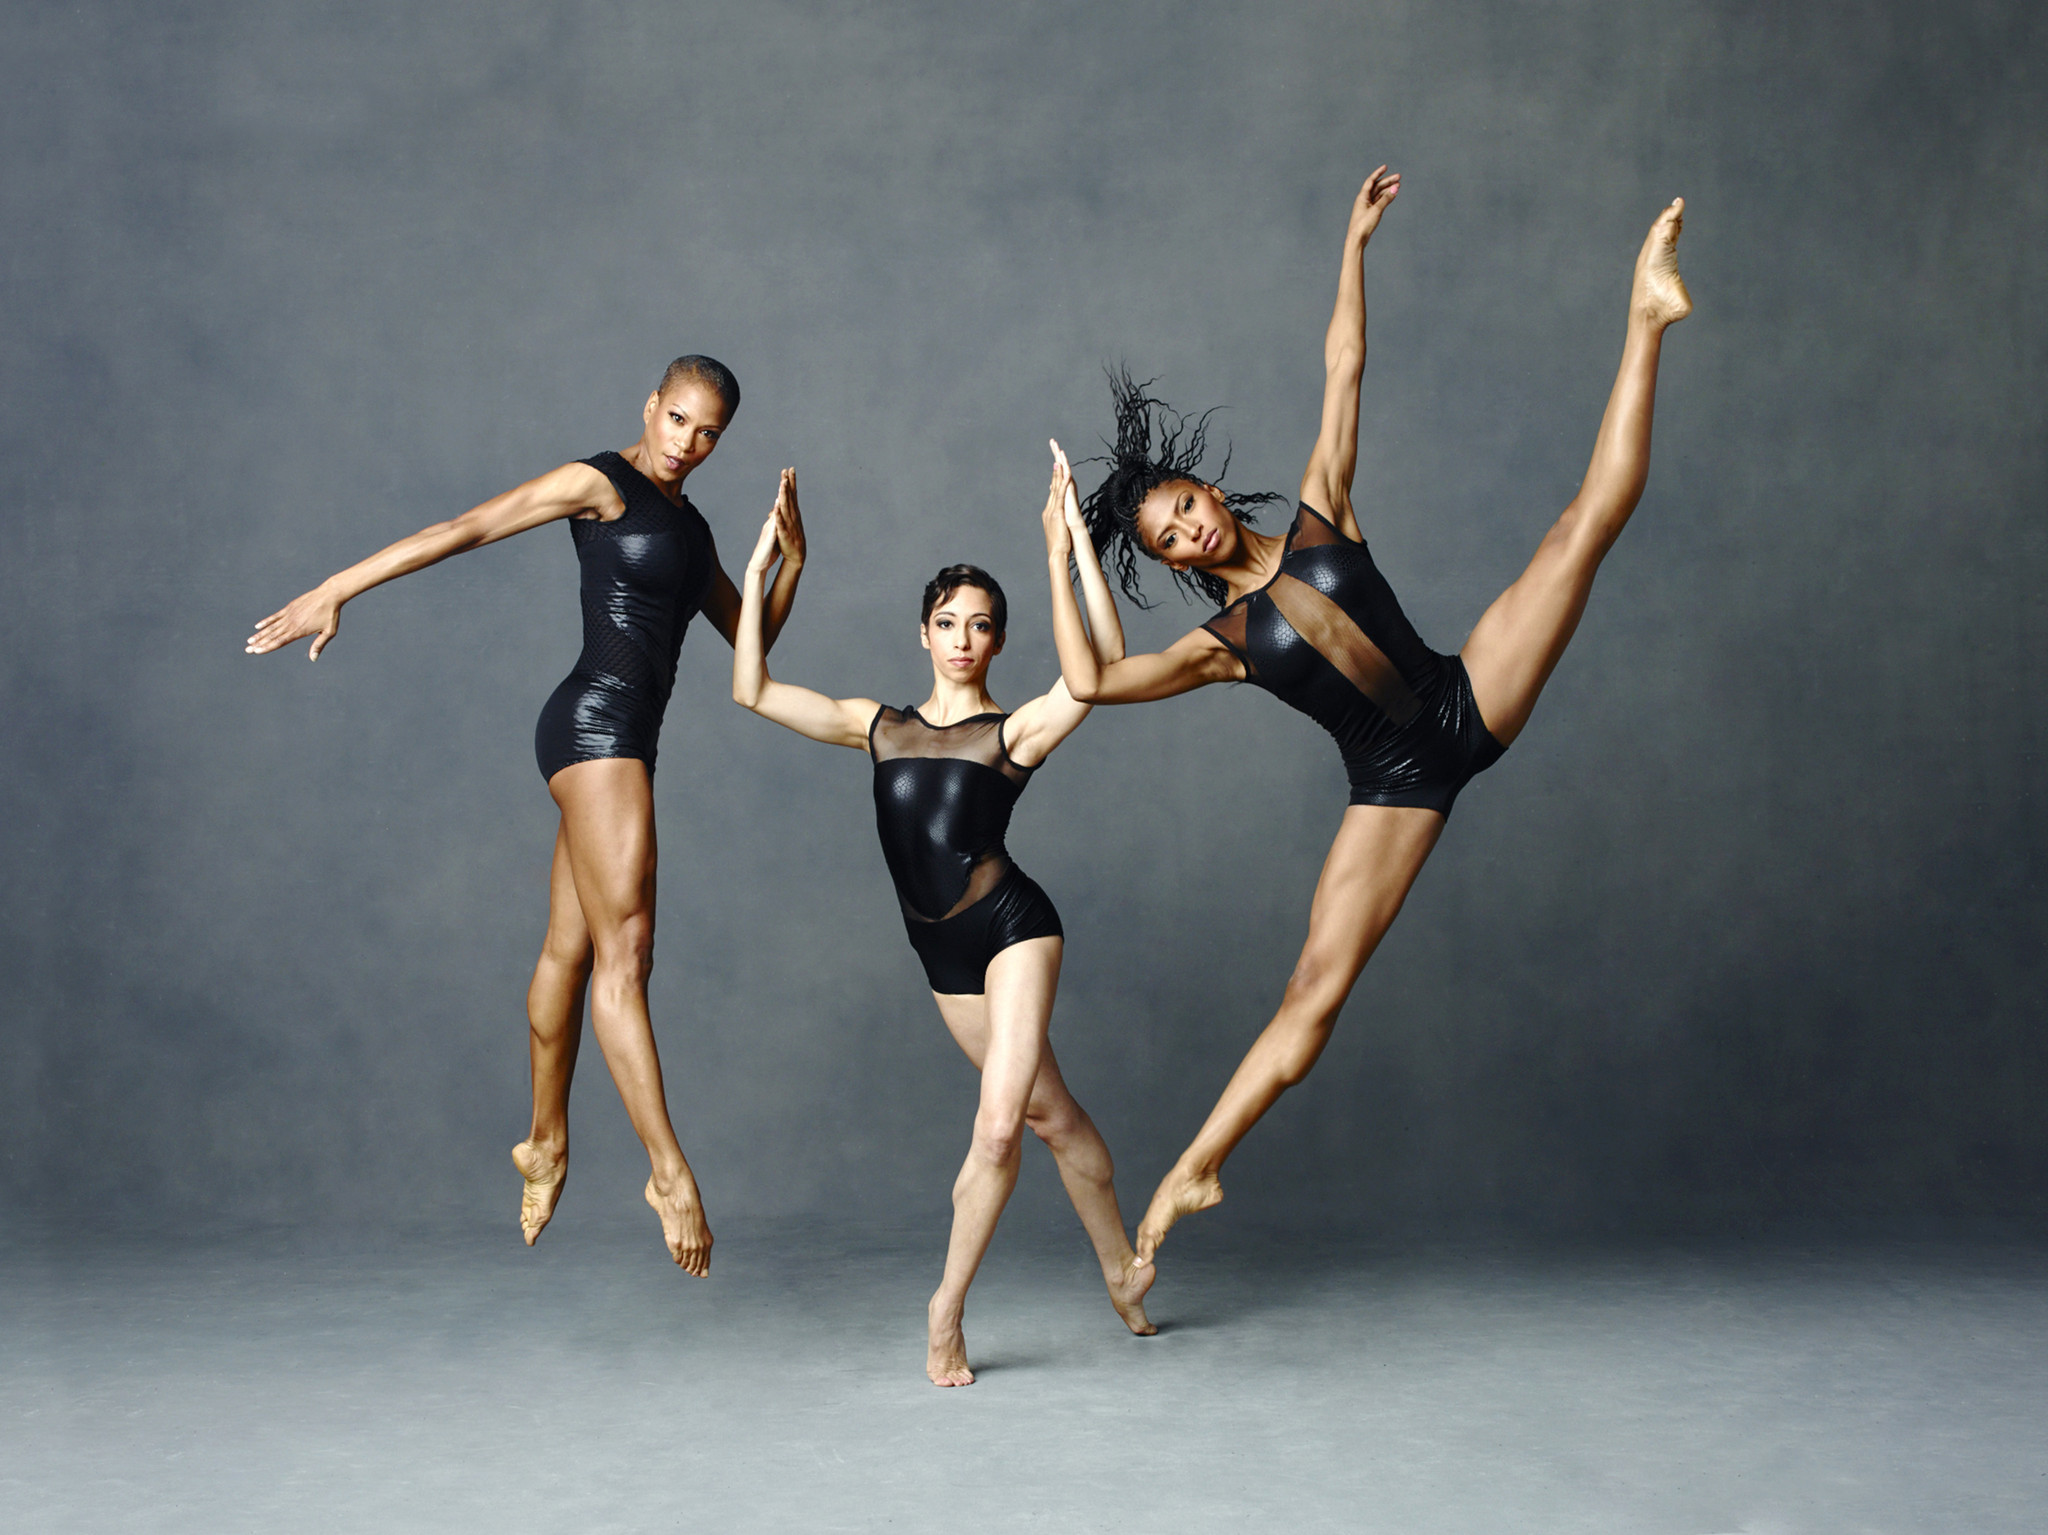 Alvin ailey american dance theater returns to the auditorium theatre